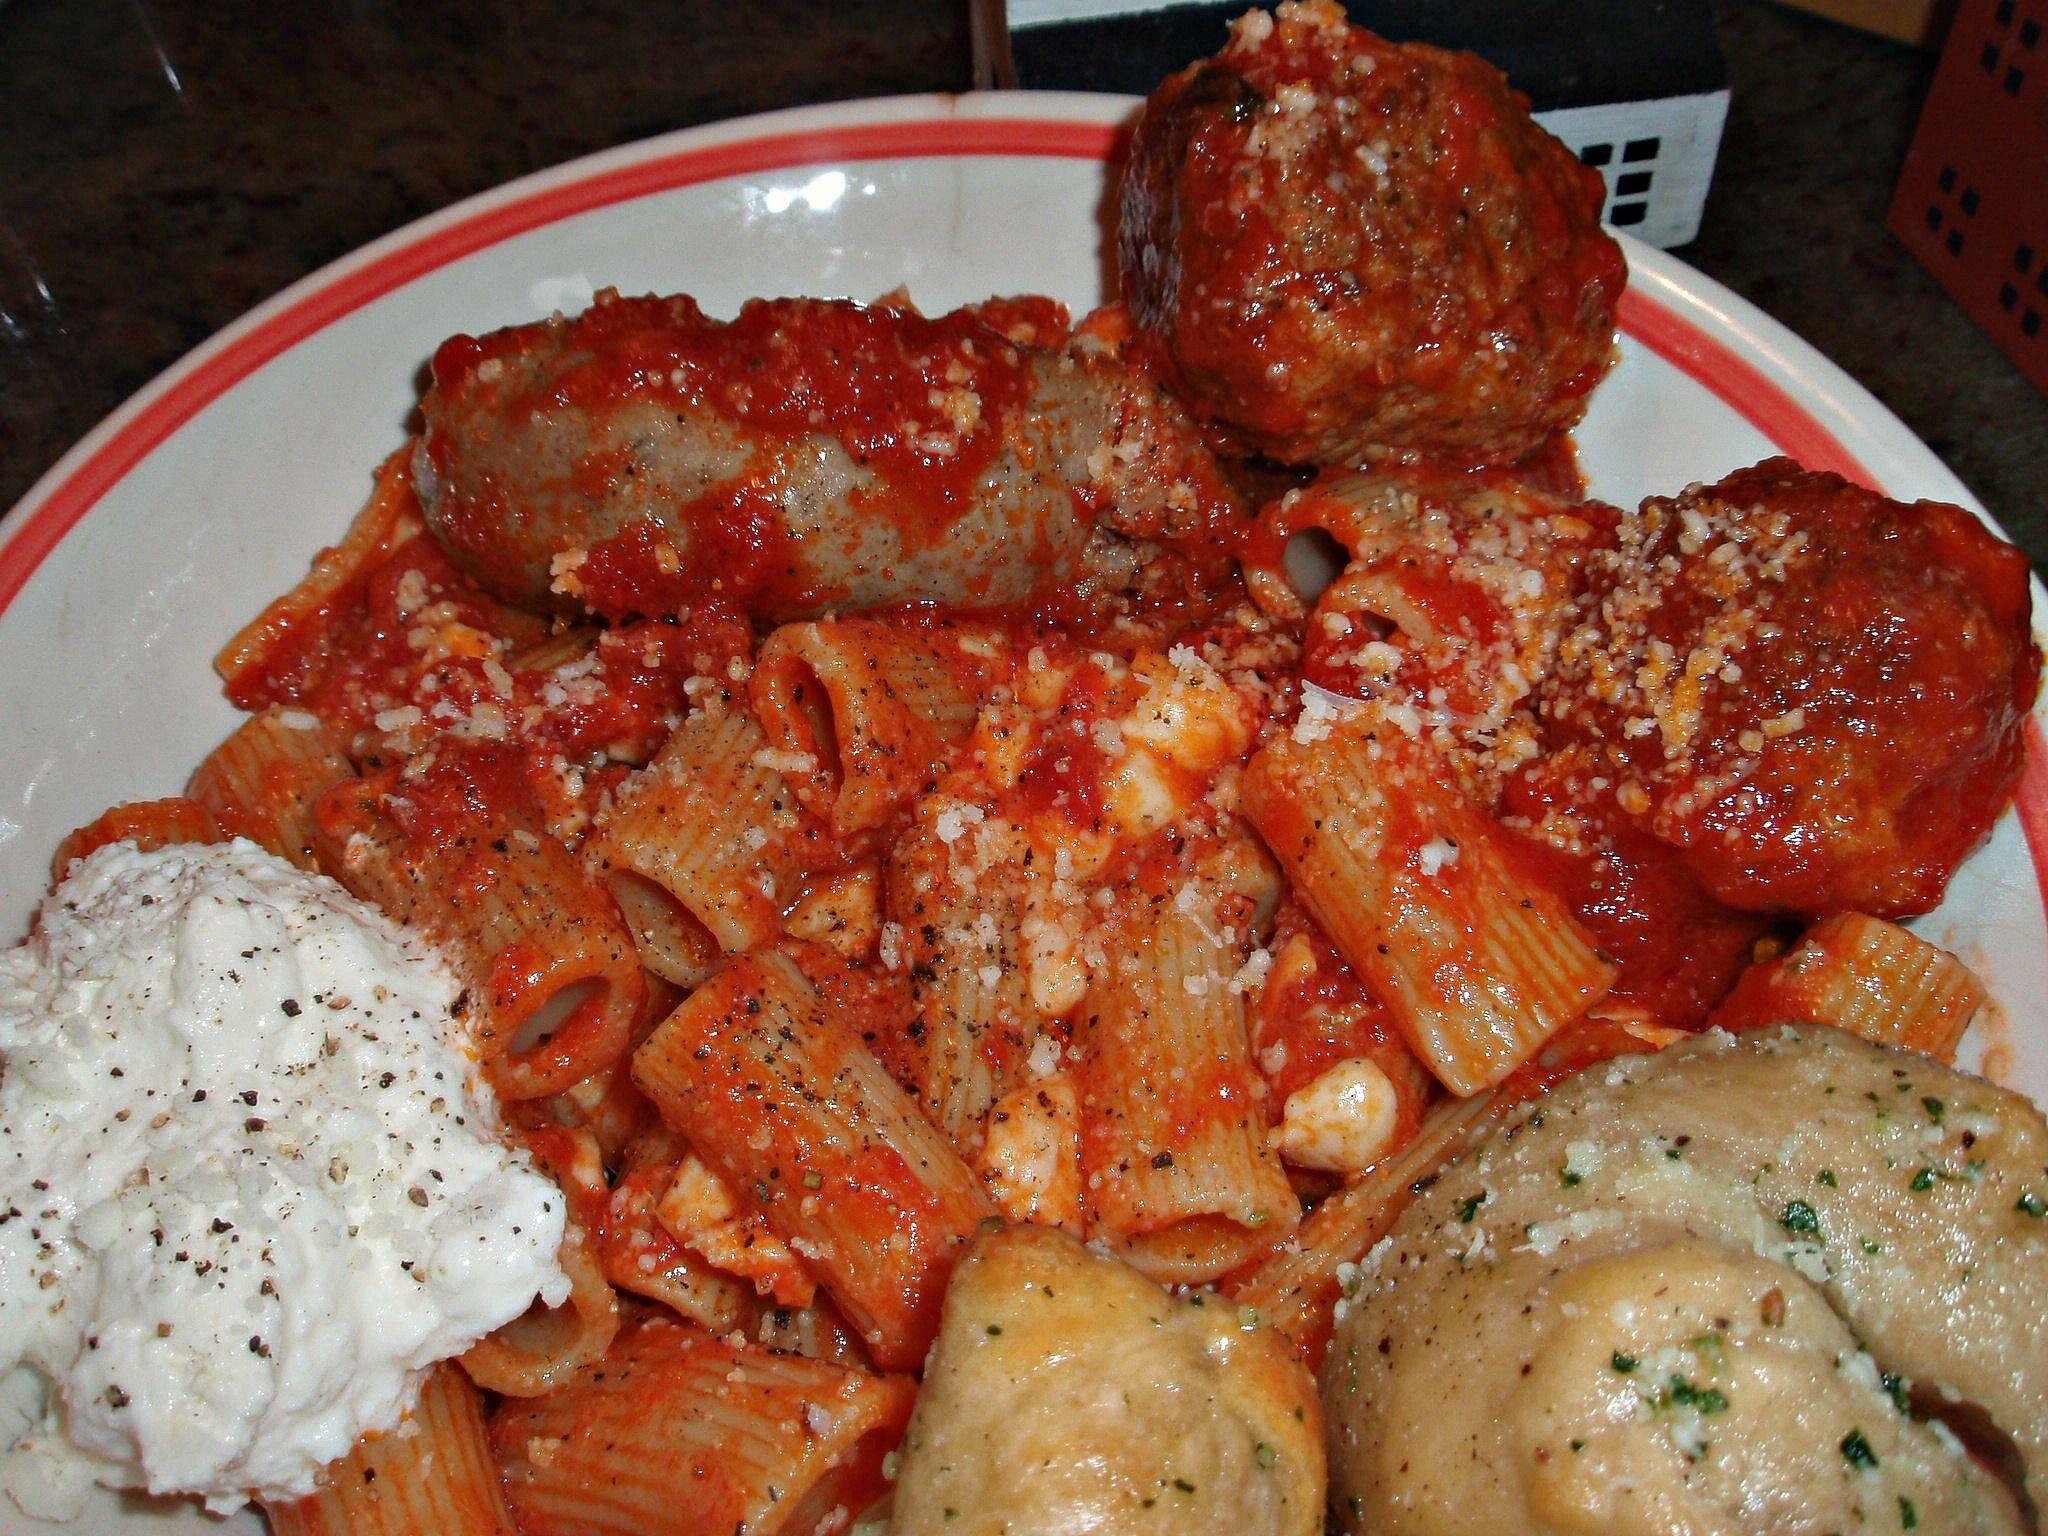 Italian-American Style...Rigatoni with Sunday Sauce, meatballs and sausage,  mozzarella and ricotta..garlic knots.